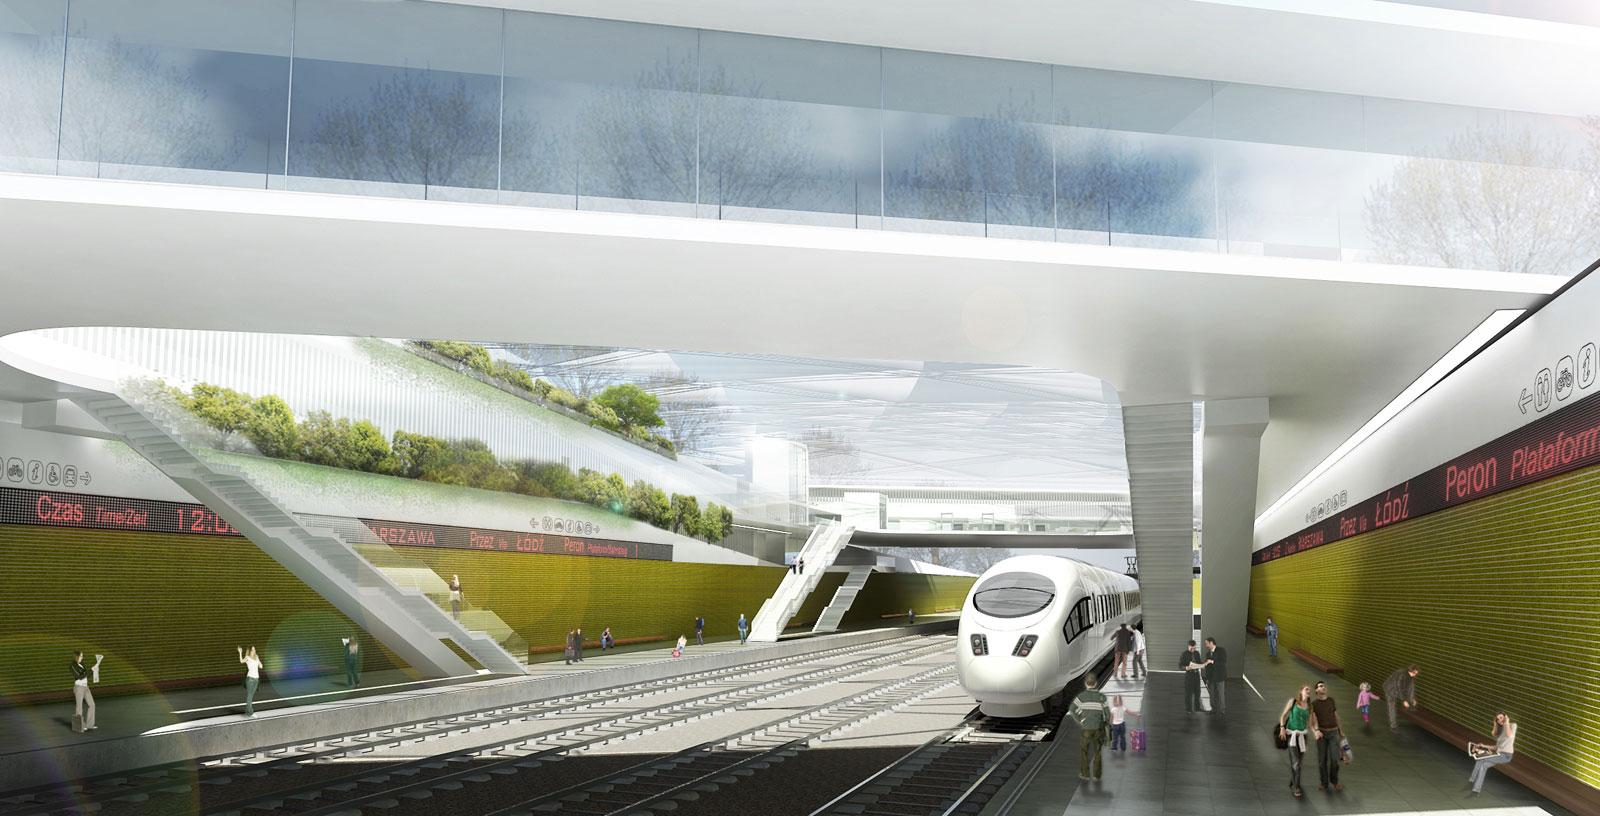 Natal-Airport_02_Architecture_IDOM_computer-graphics-Ismael-Vega_Andreia-Faley